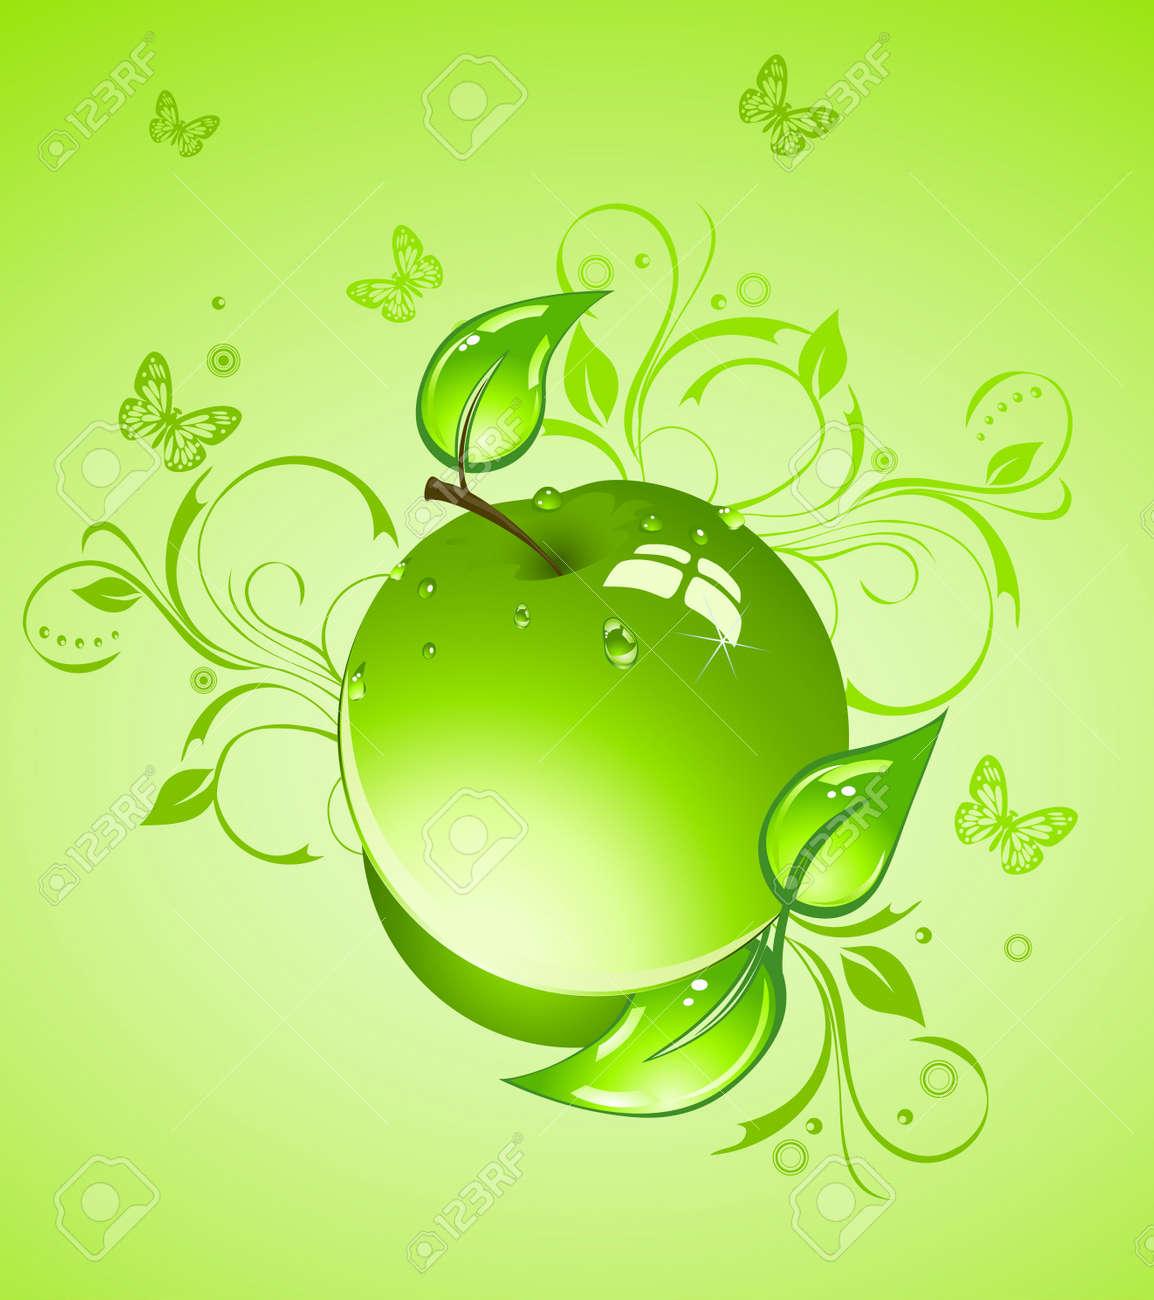 Vettoriale Apple Su Uno Sfondo Verde Image 4595683